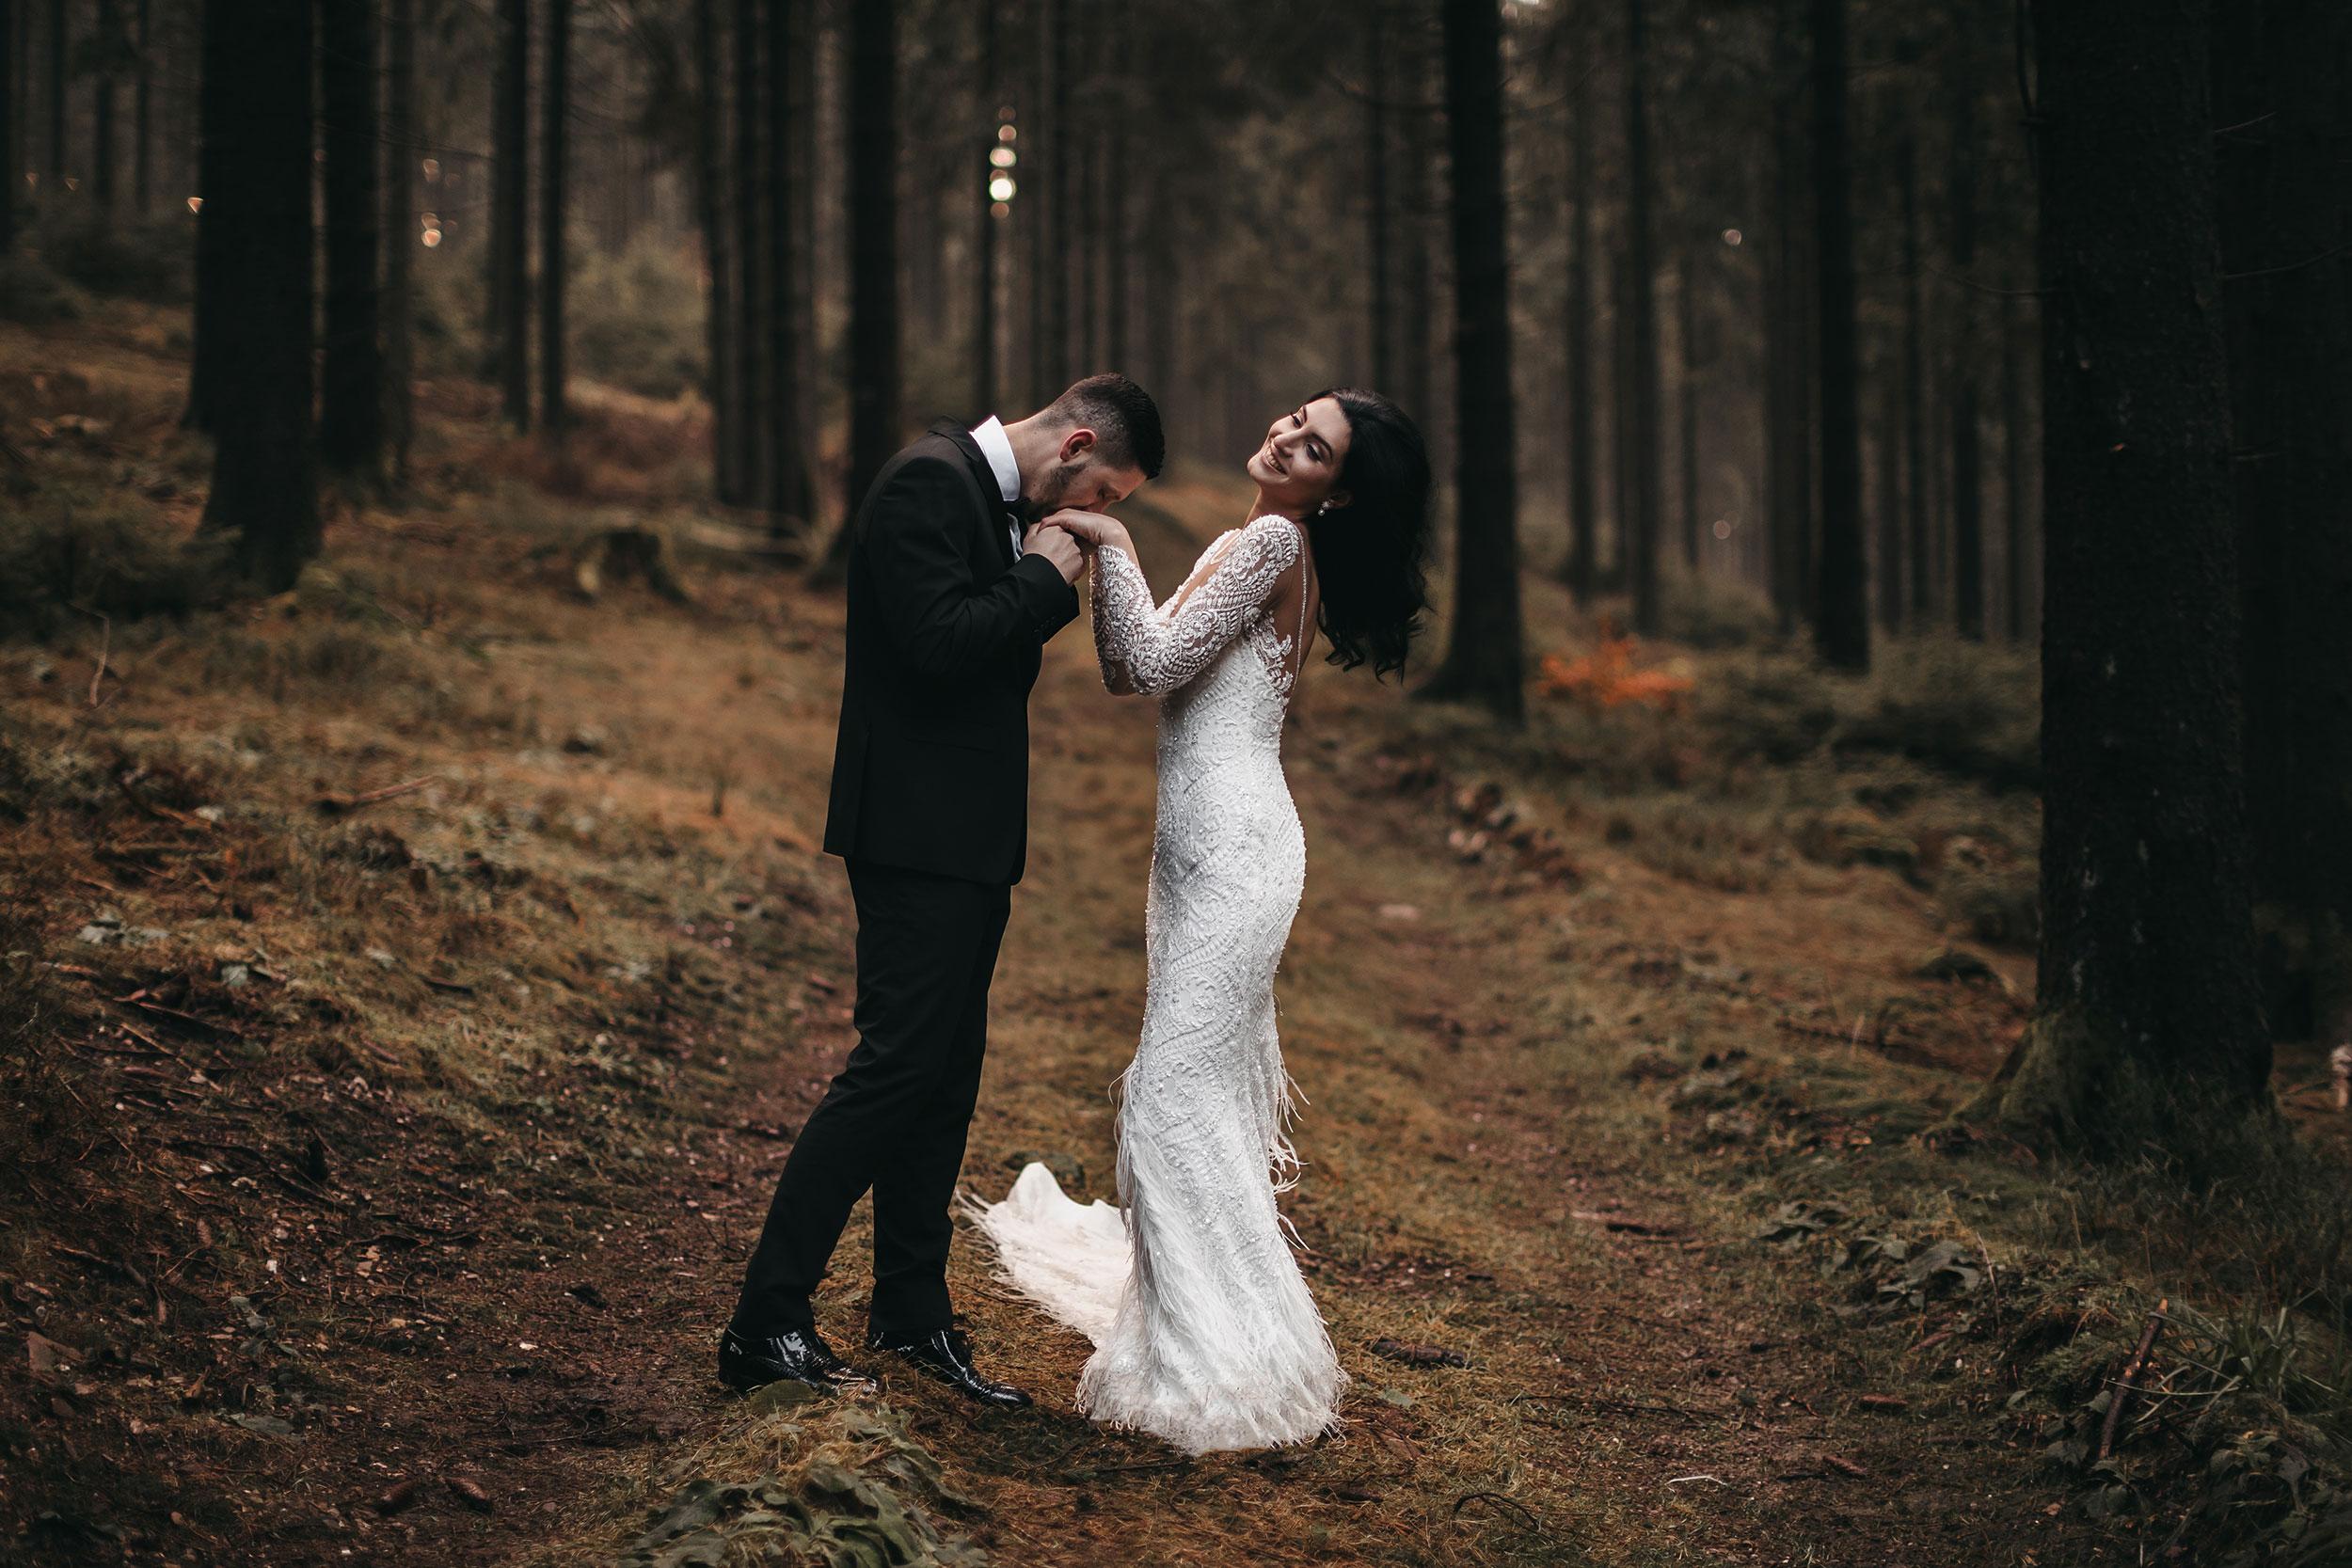 Outdoor wedding photography-Feathers wedding dress